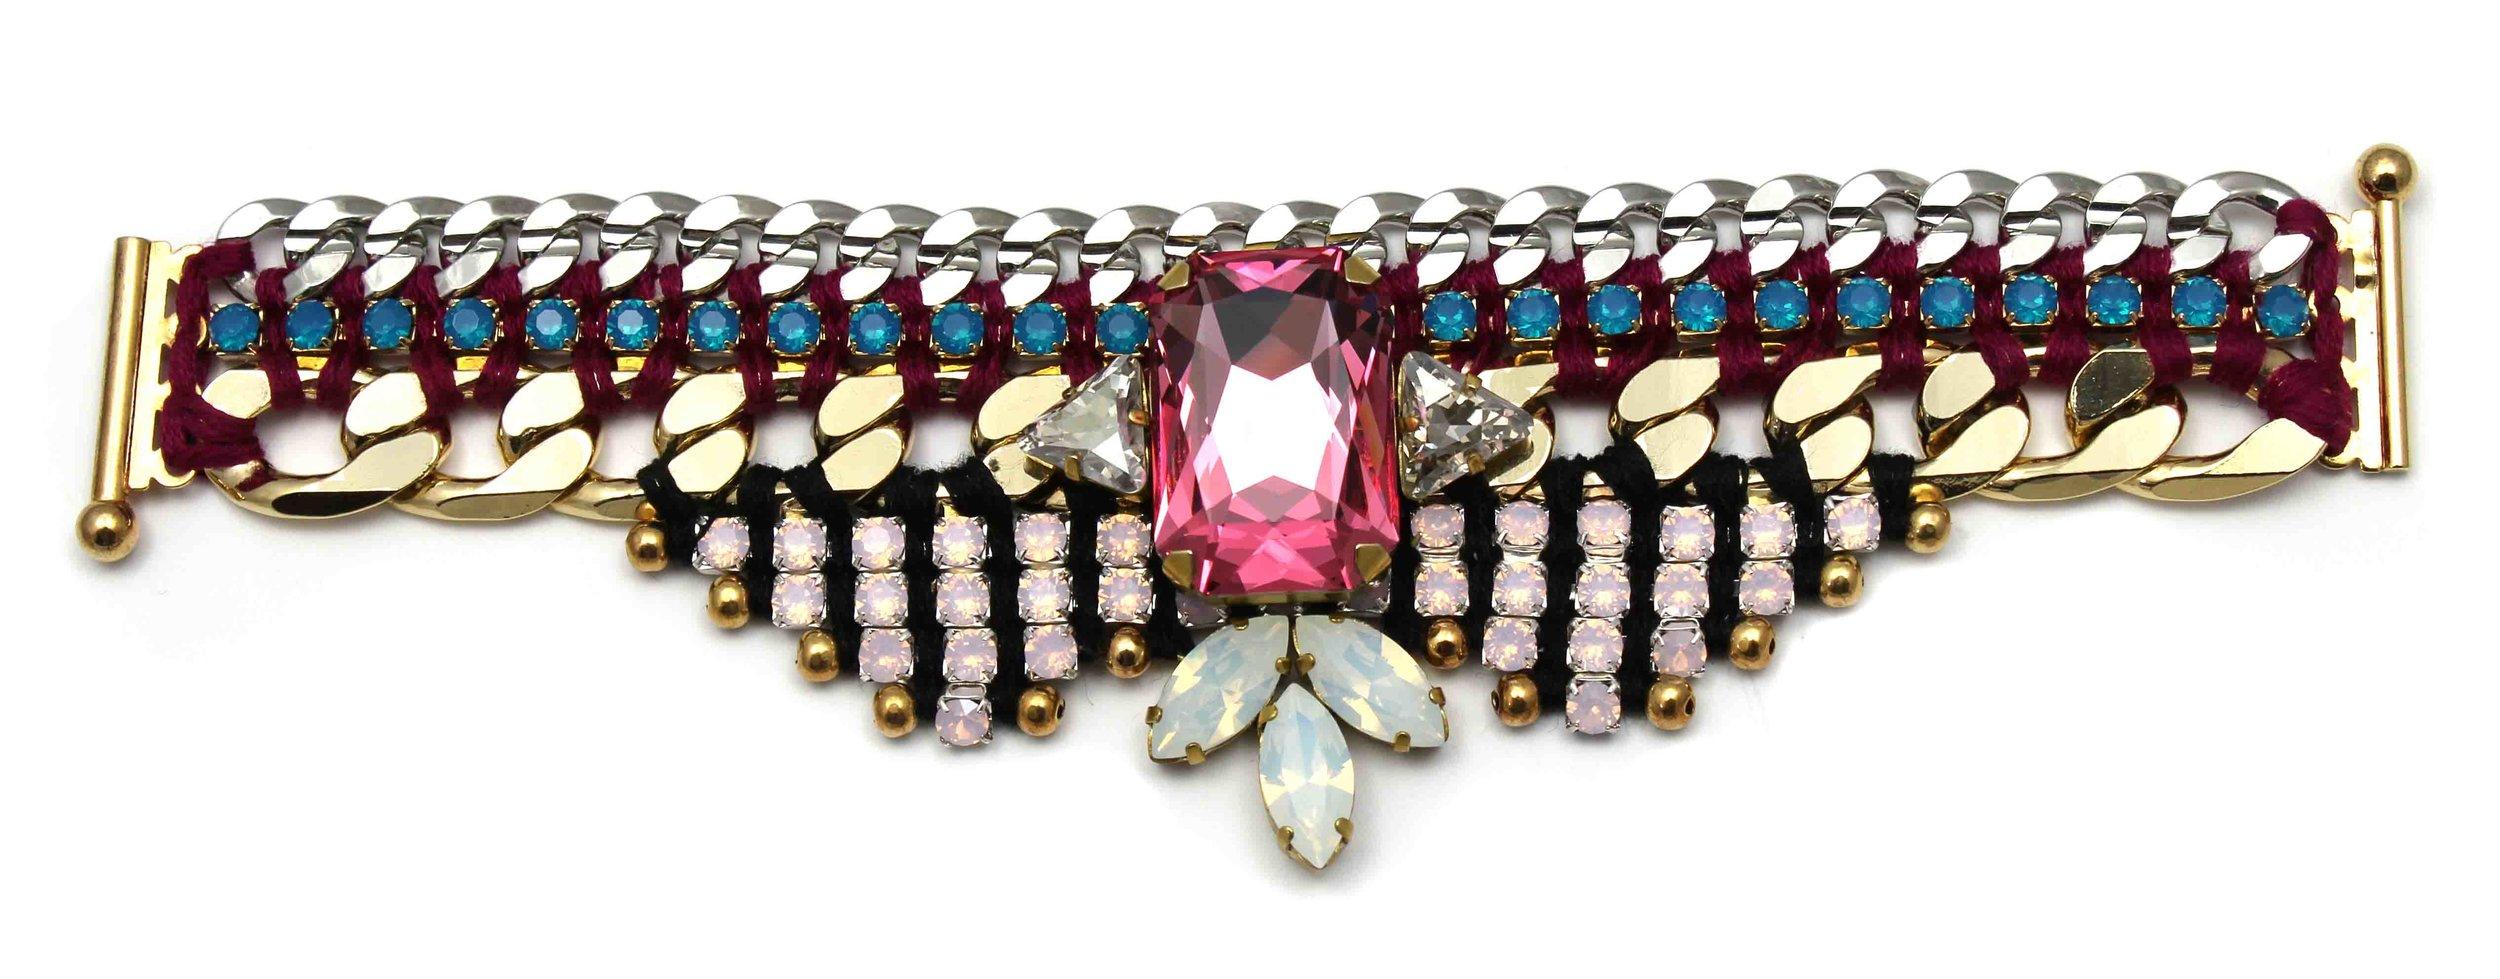 153 Tropicana Nude Embellished Bracelet.jpg